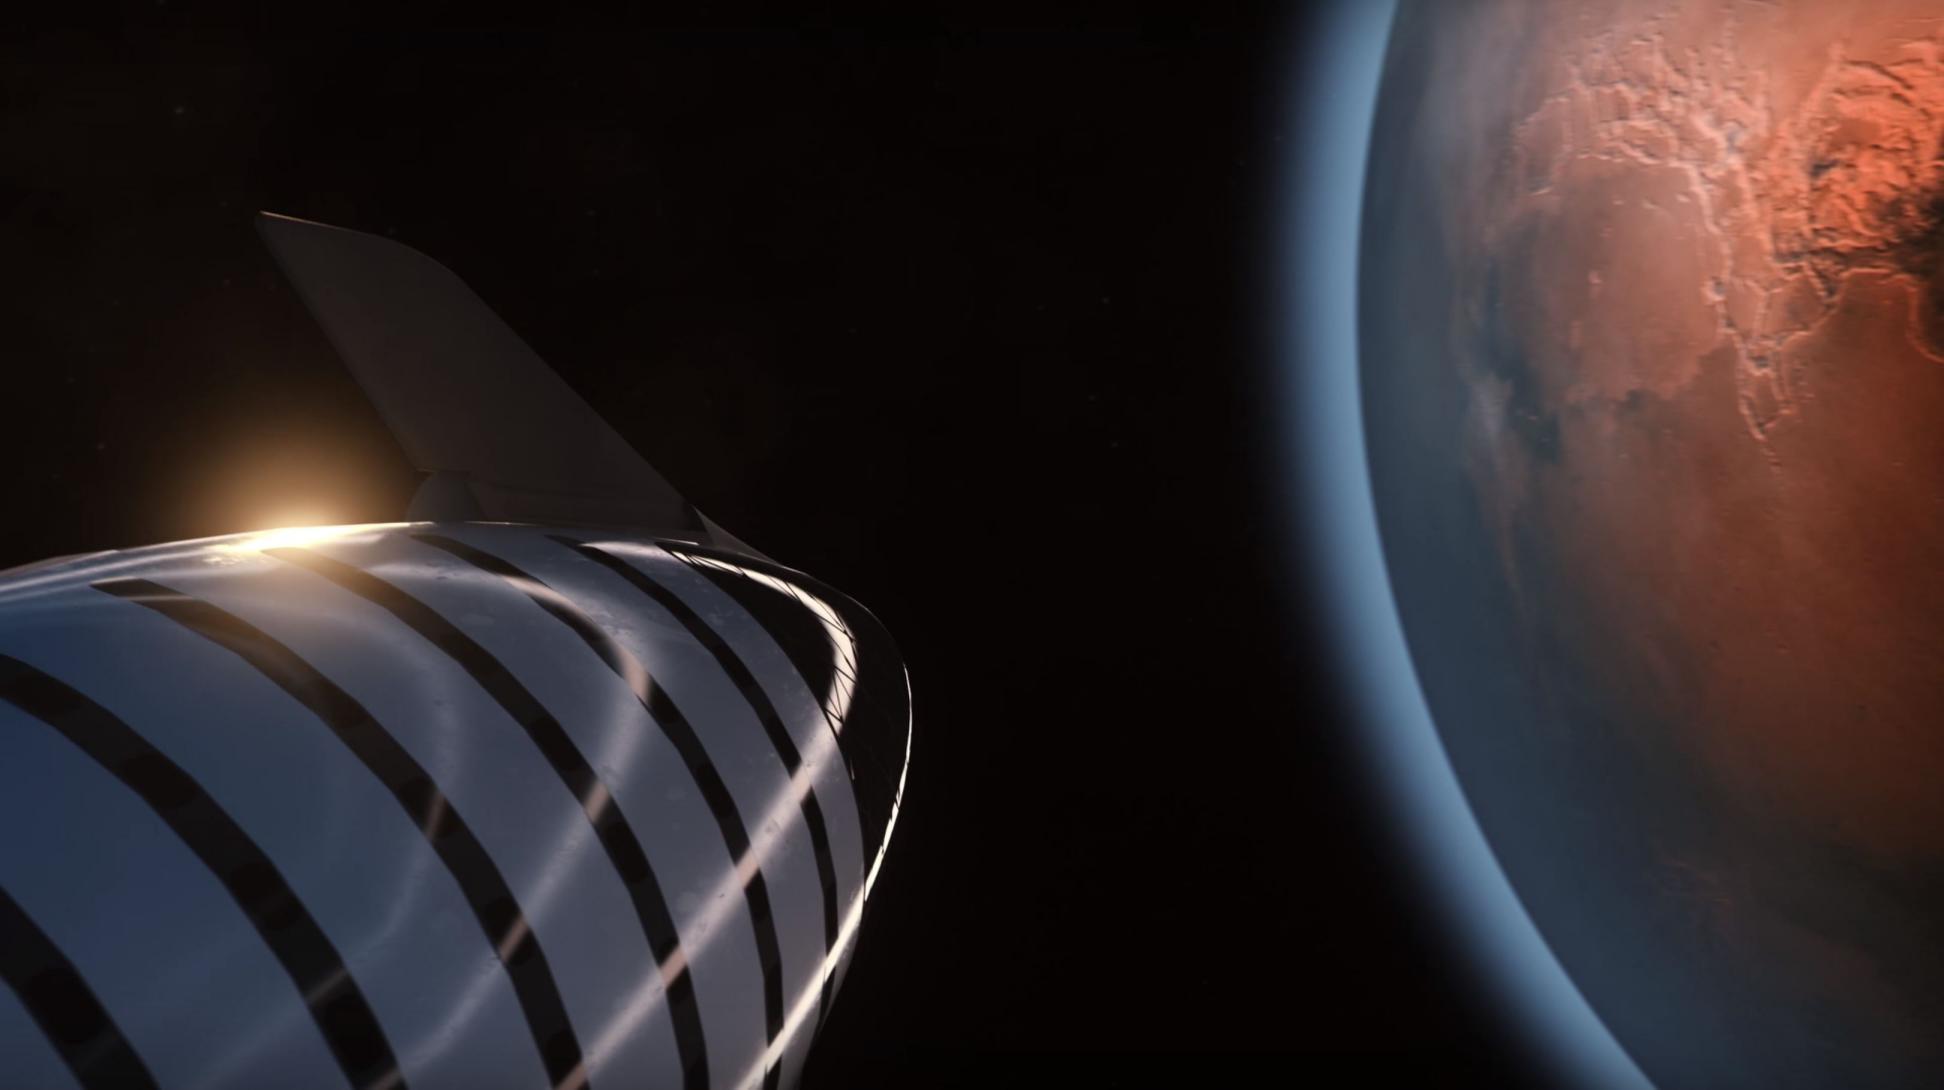 BFR 2018 spaceship Mars (SpaceX) 1(c)